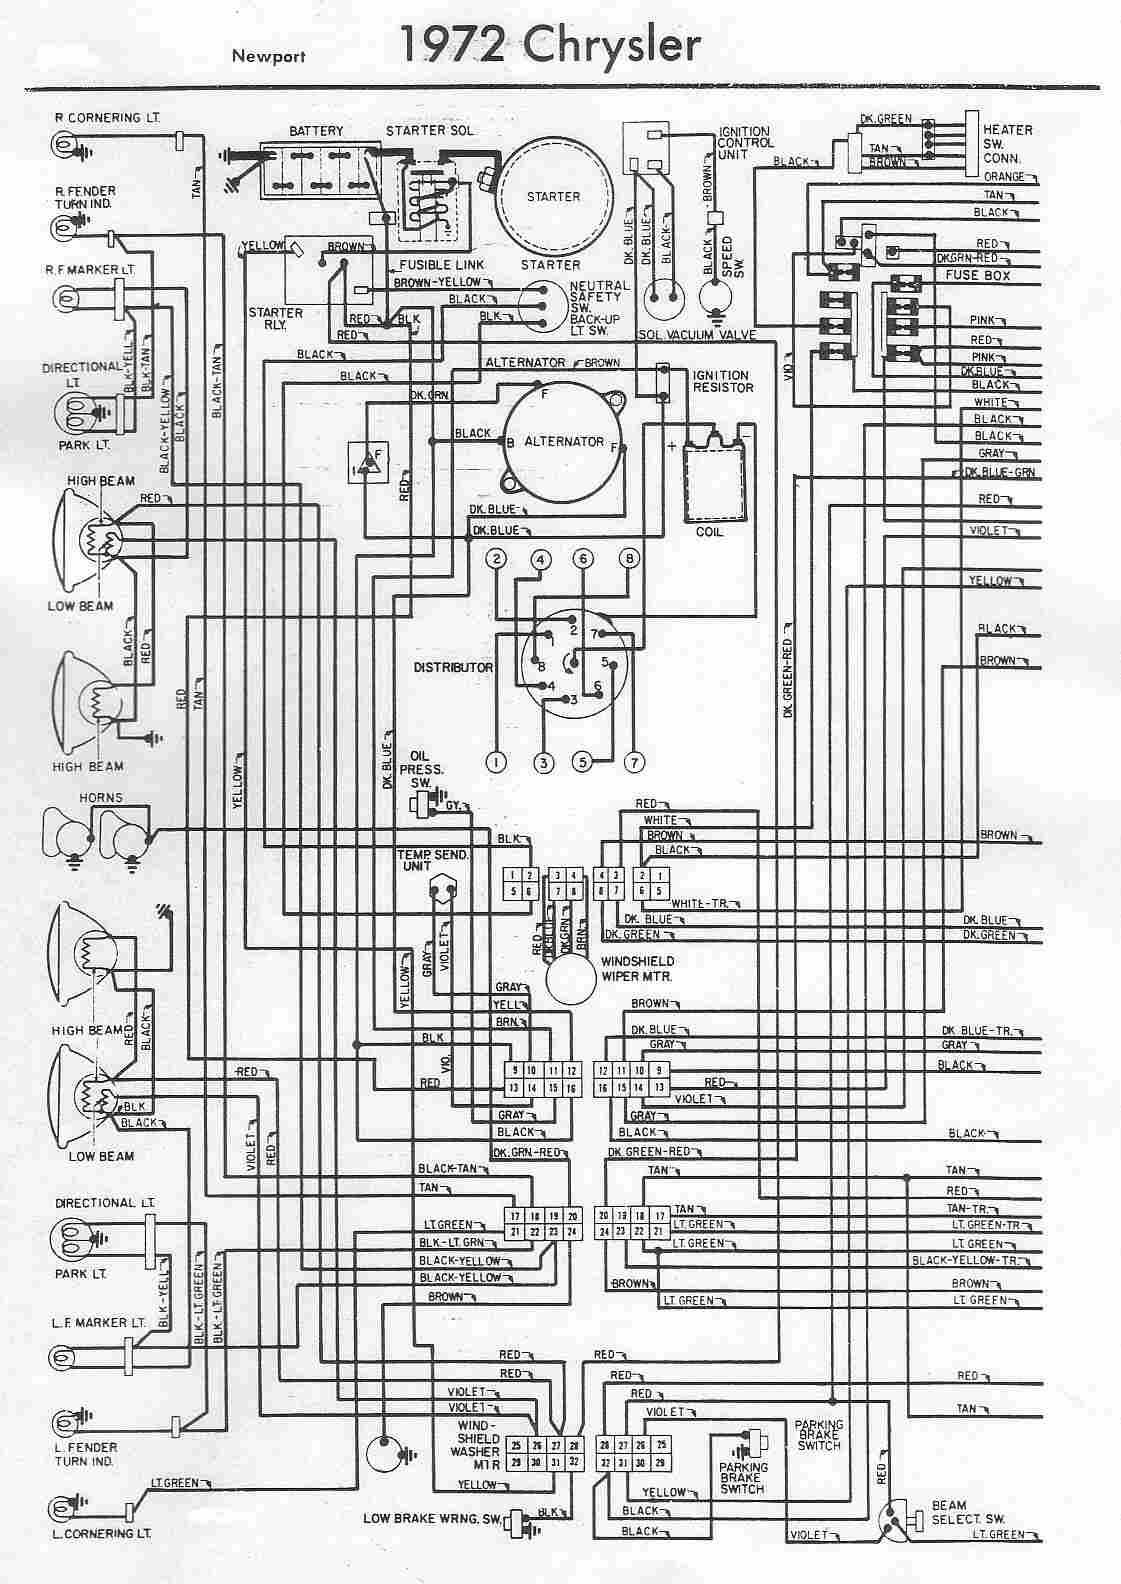 1972 Car Chrysler Newport Electrical Wiring Diagram Schematic Electrical Wiring Diagram Chrysler Newport Diagram